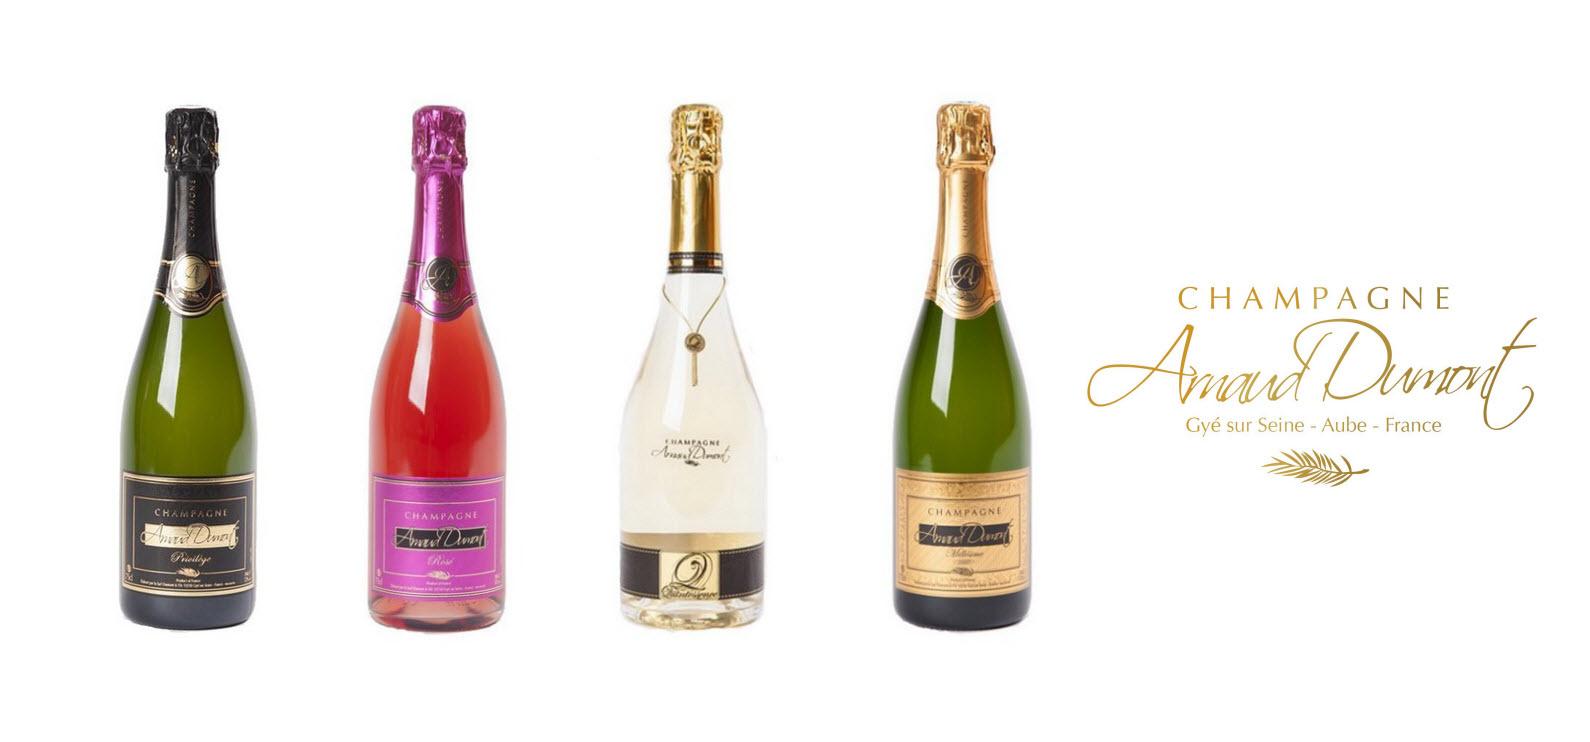 Champagne Arnaud Dumont